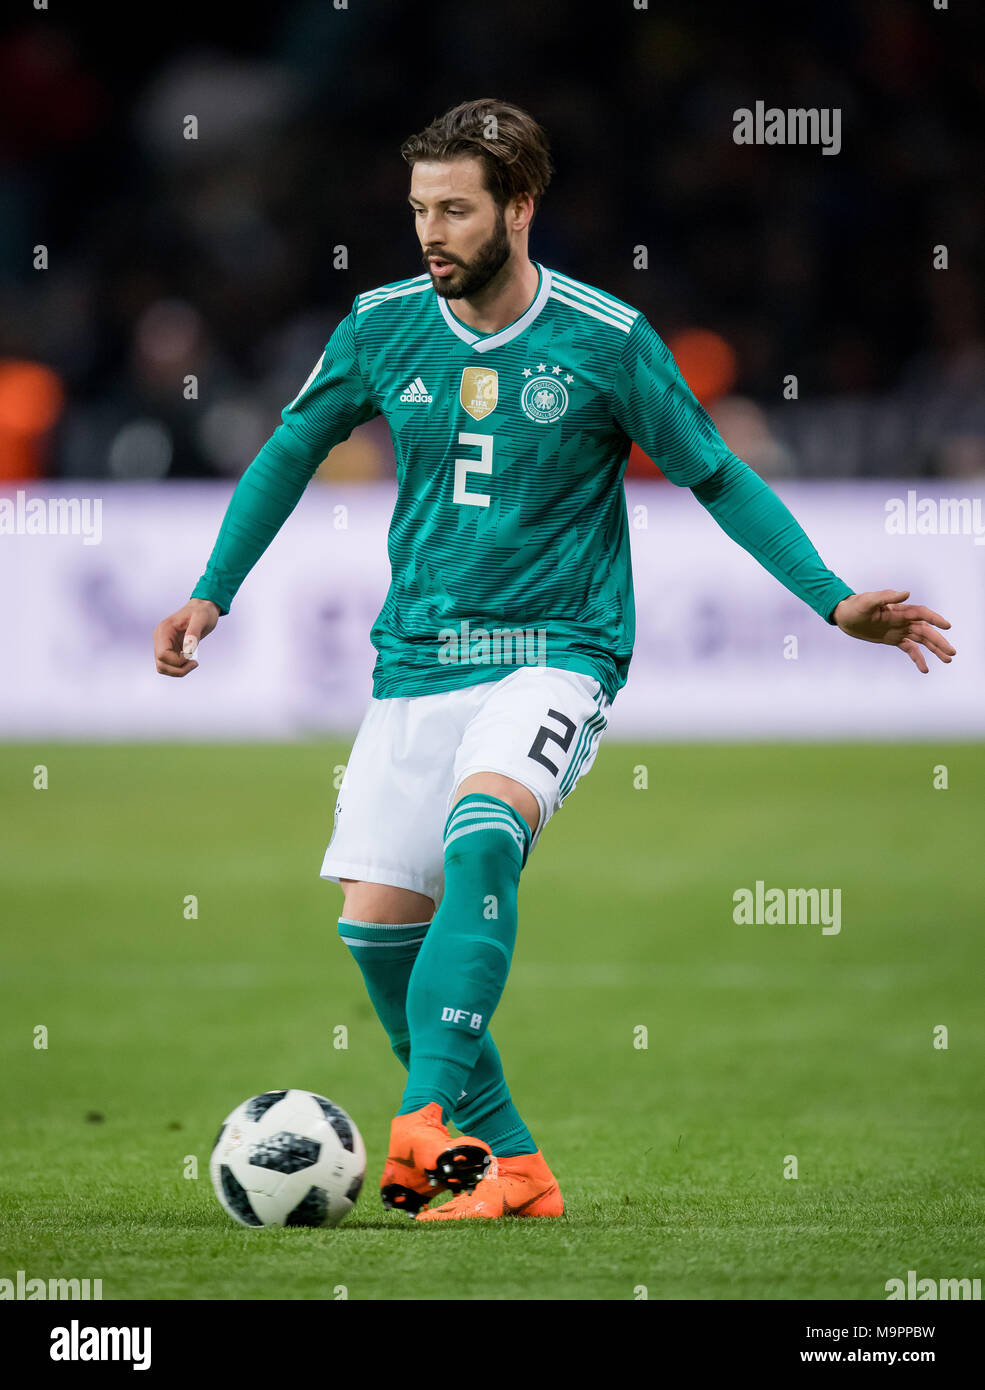 Marvin Plattenhardt (Germany) am Ball  GES/ Fussball/ Freundschaftsspiel: Germany - Brasilien, 27.03.2018  Football / Soccer: Friendly Match: Germany vs Brazil, Berlin, March 27, 2018 |usage worldwide - Stock Image